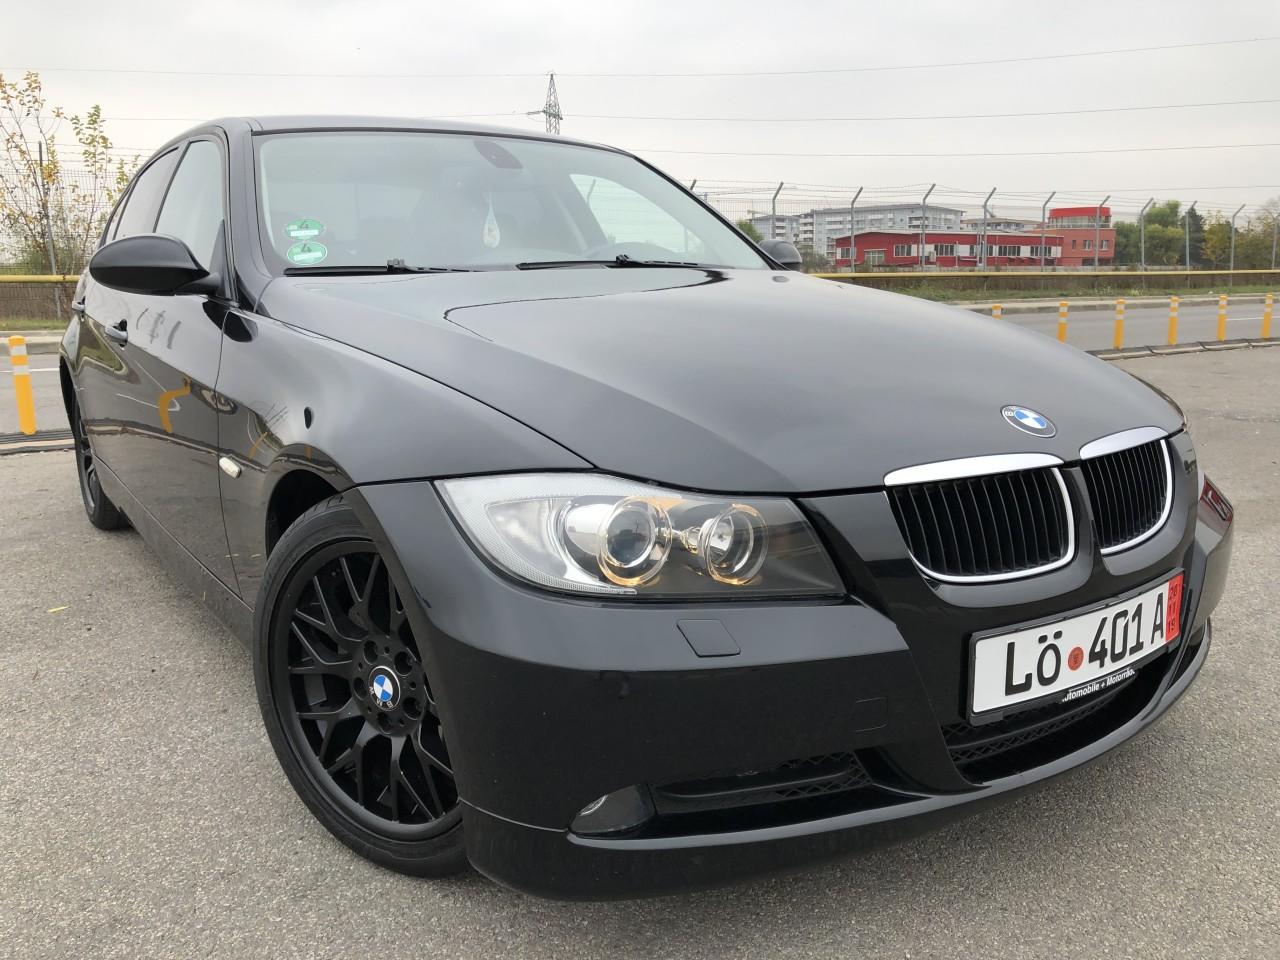 BMW 320 BMW 320d An 2007-163Cp / Navigatie / XENON / Pilot /Scaune semi-piele/ Senzori parcare / Scaune incalzite / RECENT ADUSA DIN GERMANIA!!! 2007